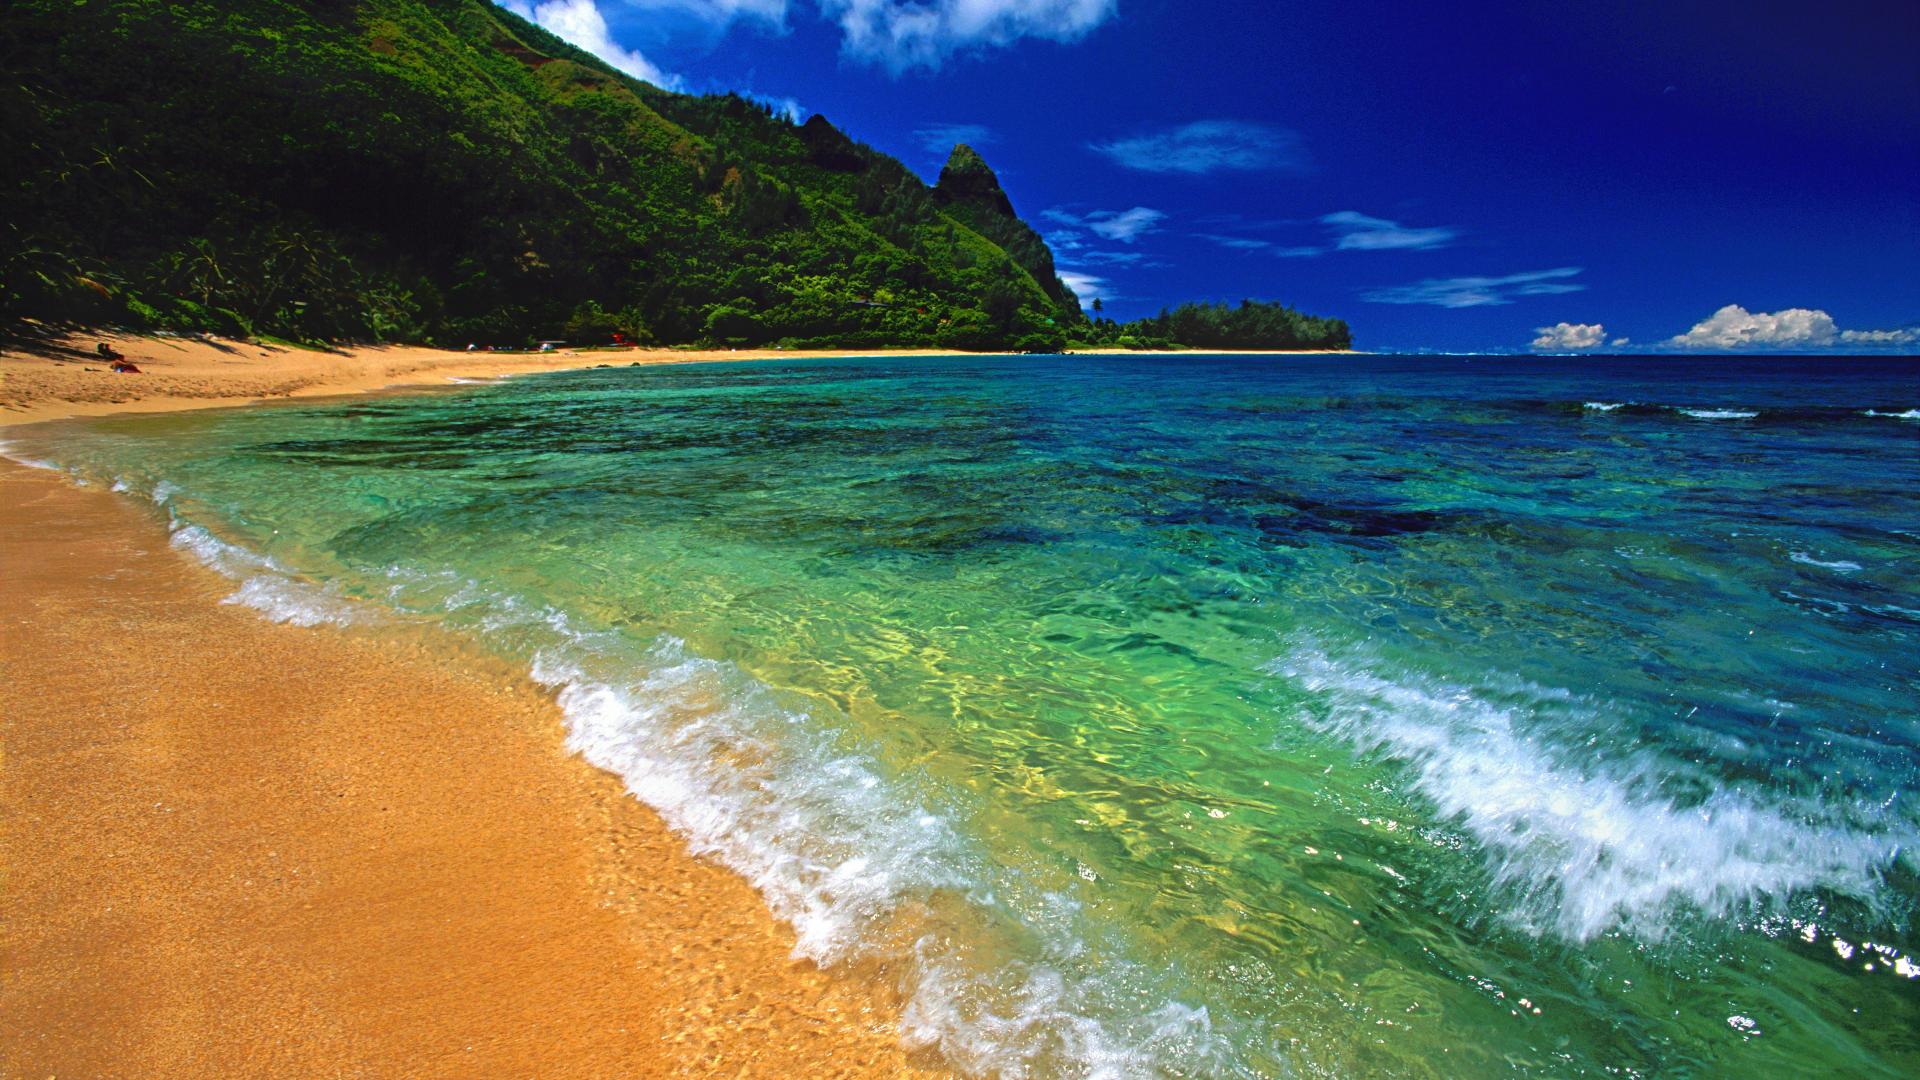 Beach Computer Wallpaper Background Download HD Wallpapers 1920x1080